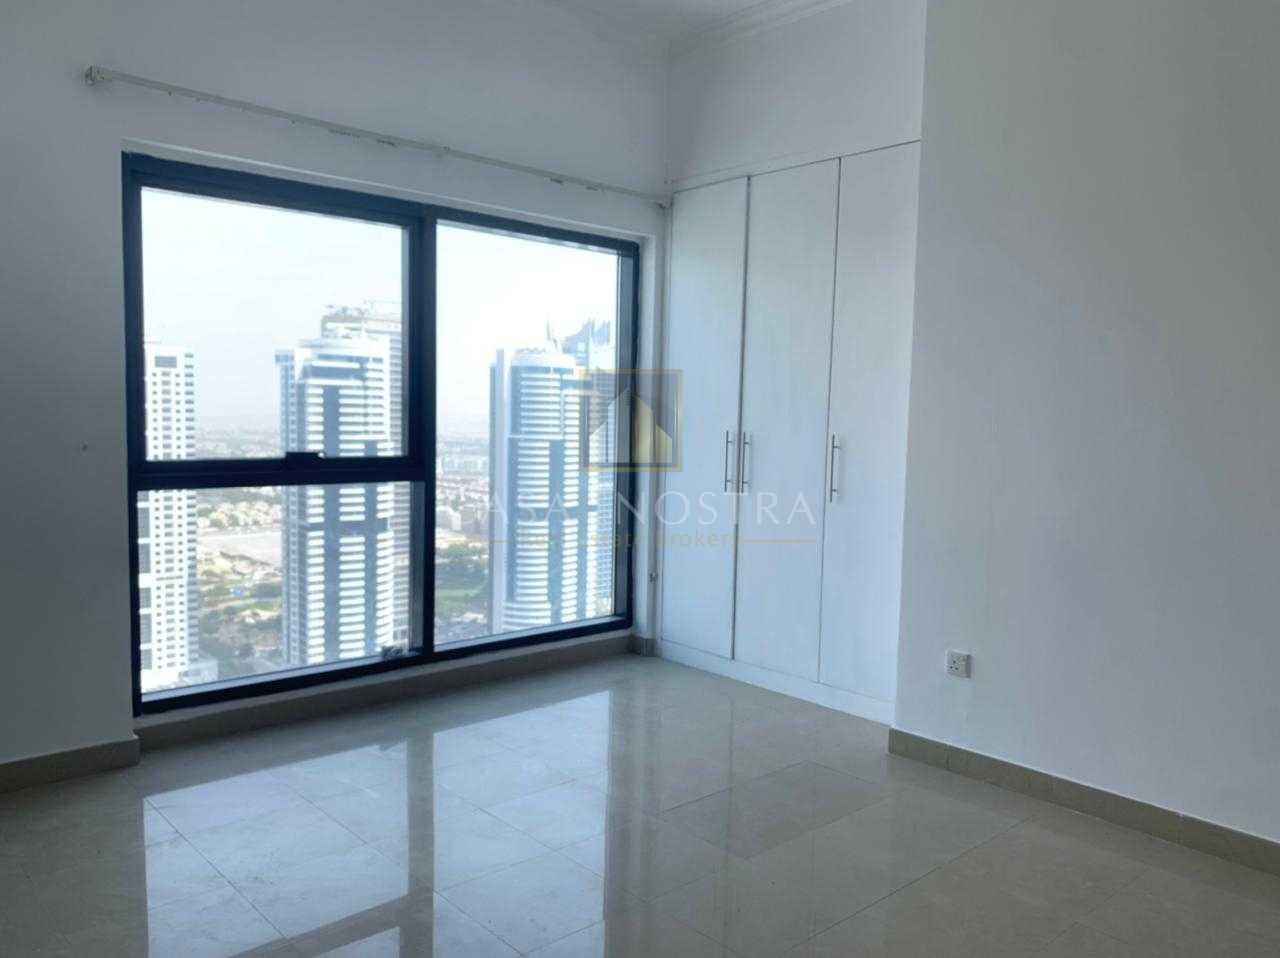 Higher Floor 1BR Direct Marina Walk I No Balcony